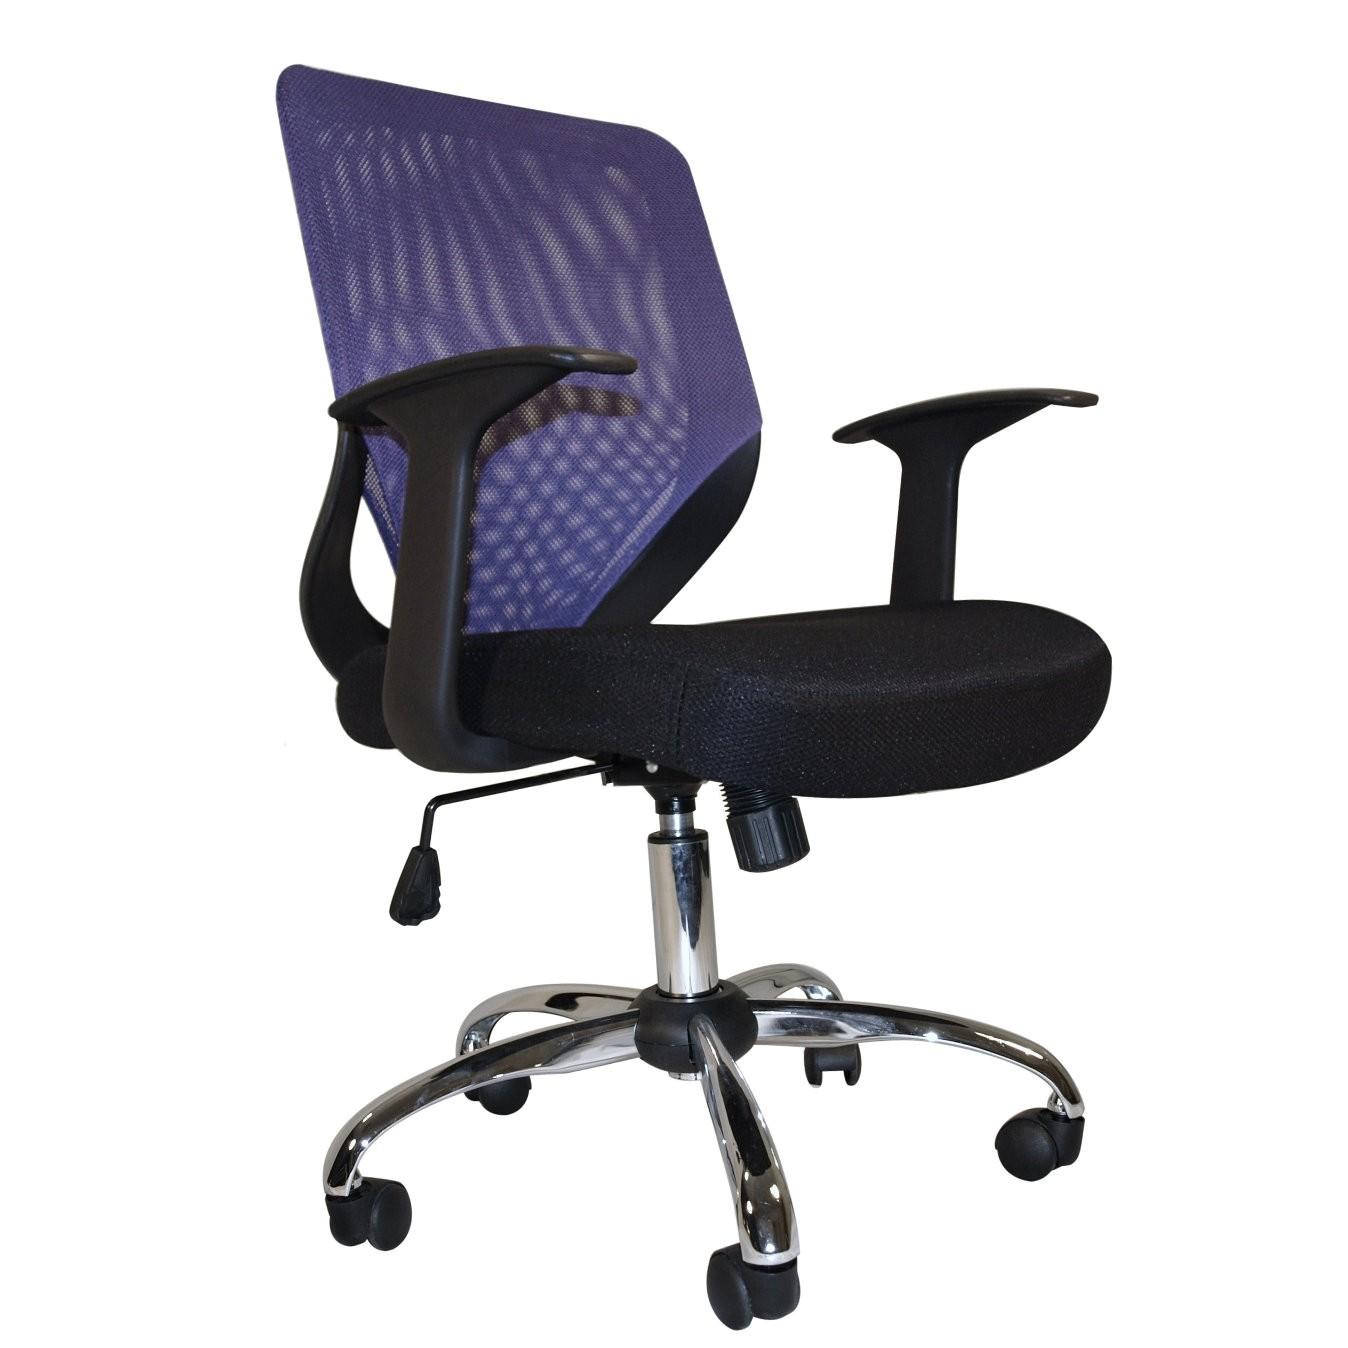 Atlanta Purple Mesh Back Office Chair